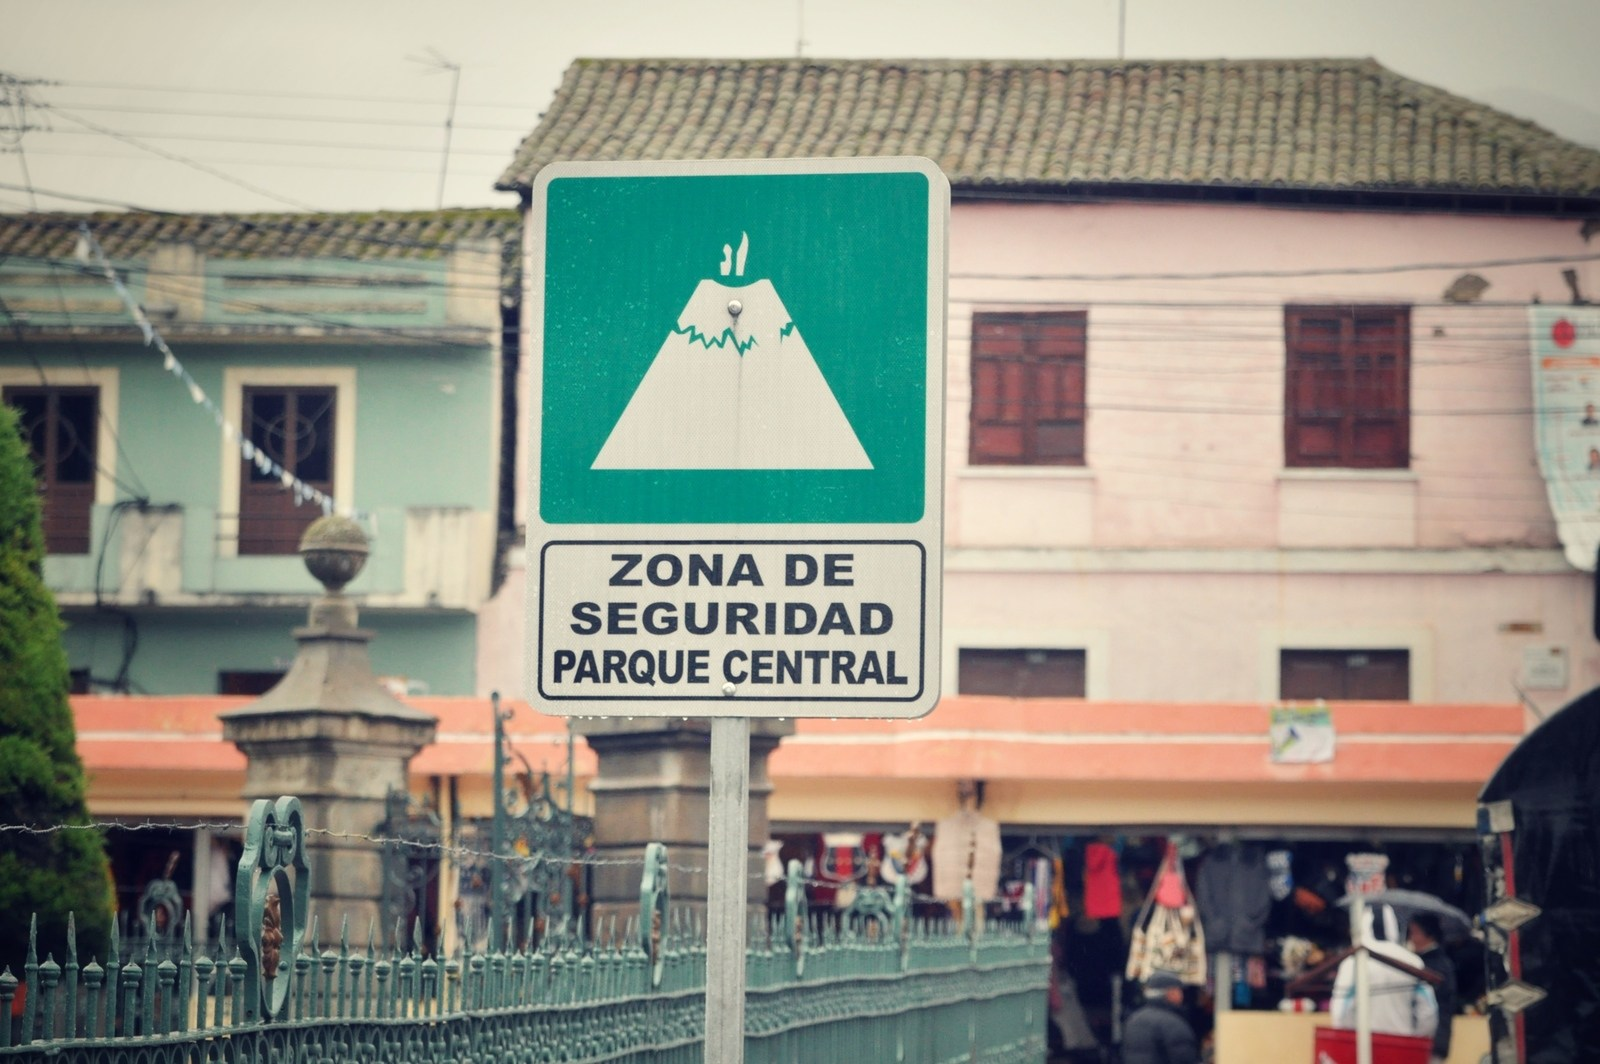 Zona de seguridad, Equateur Riobamba